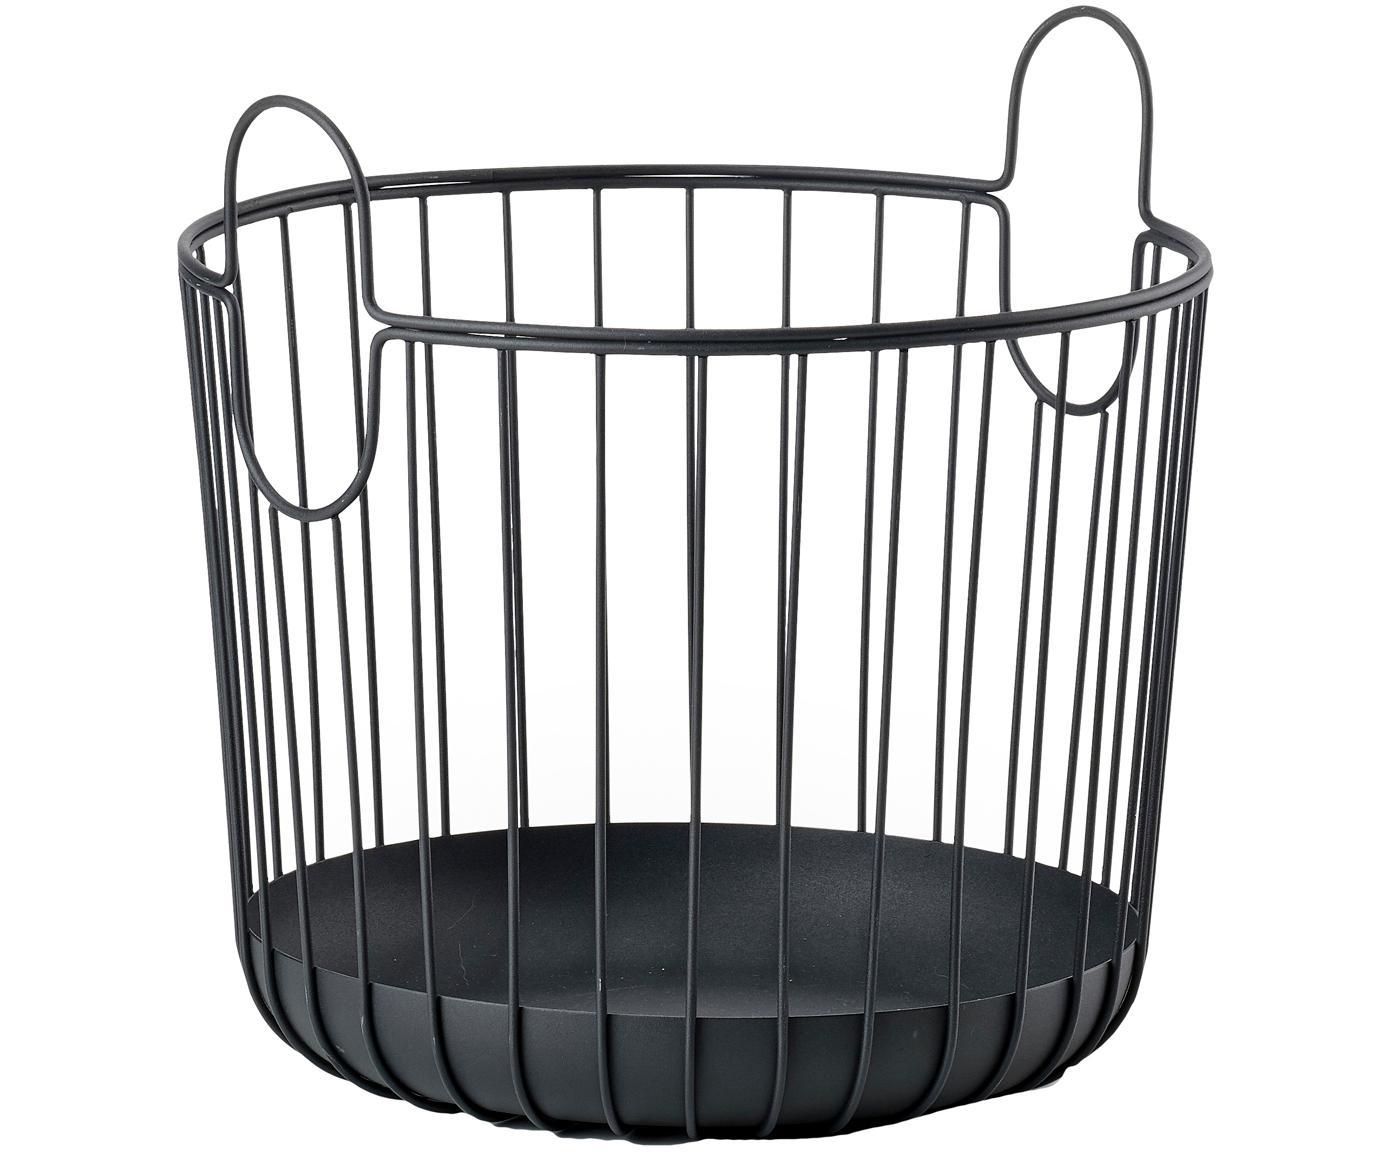 Cesto Ina, Metallo, Nero, Ø 30 x Alt. 31 cm